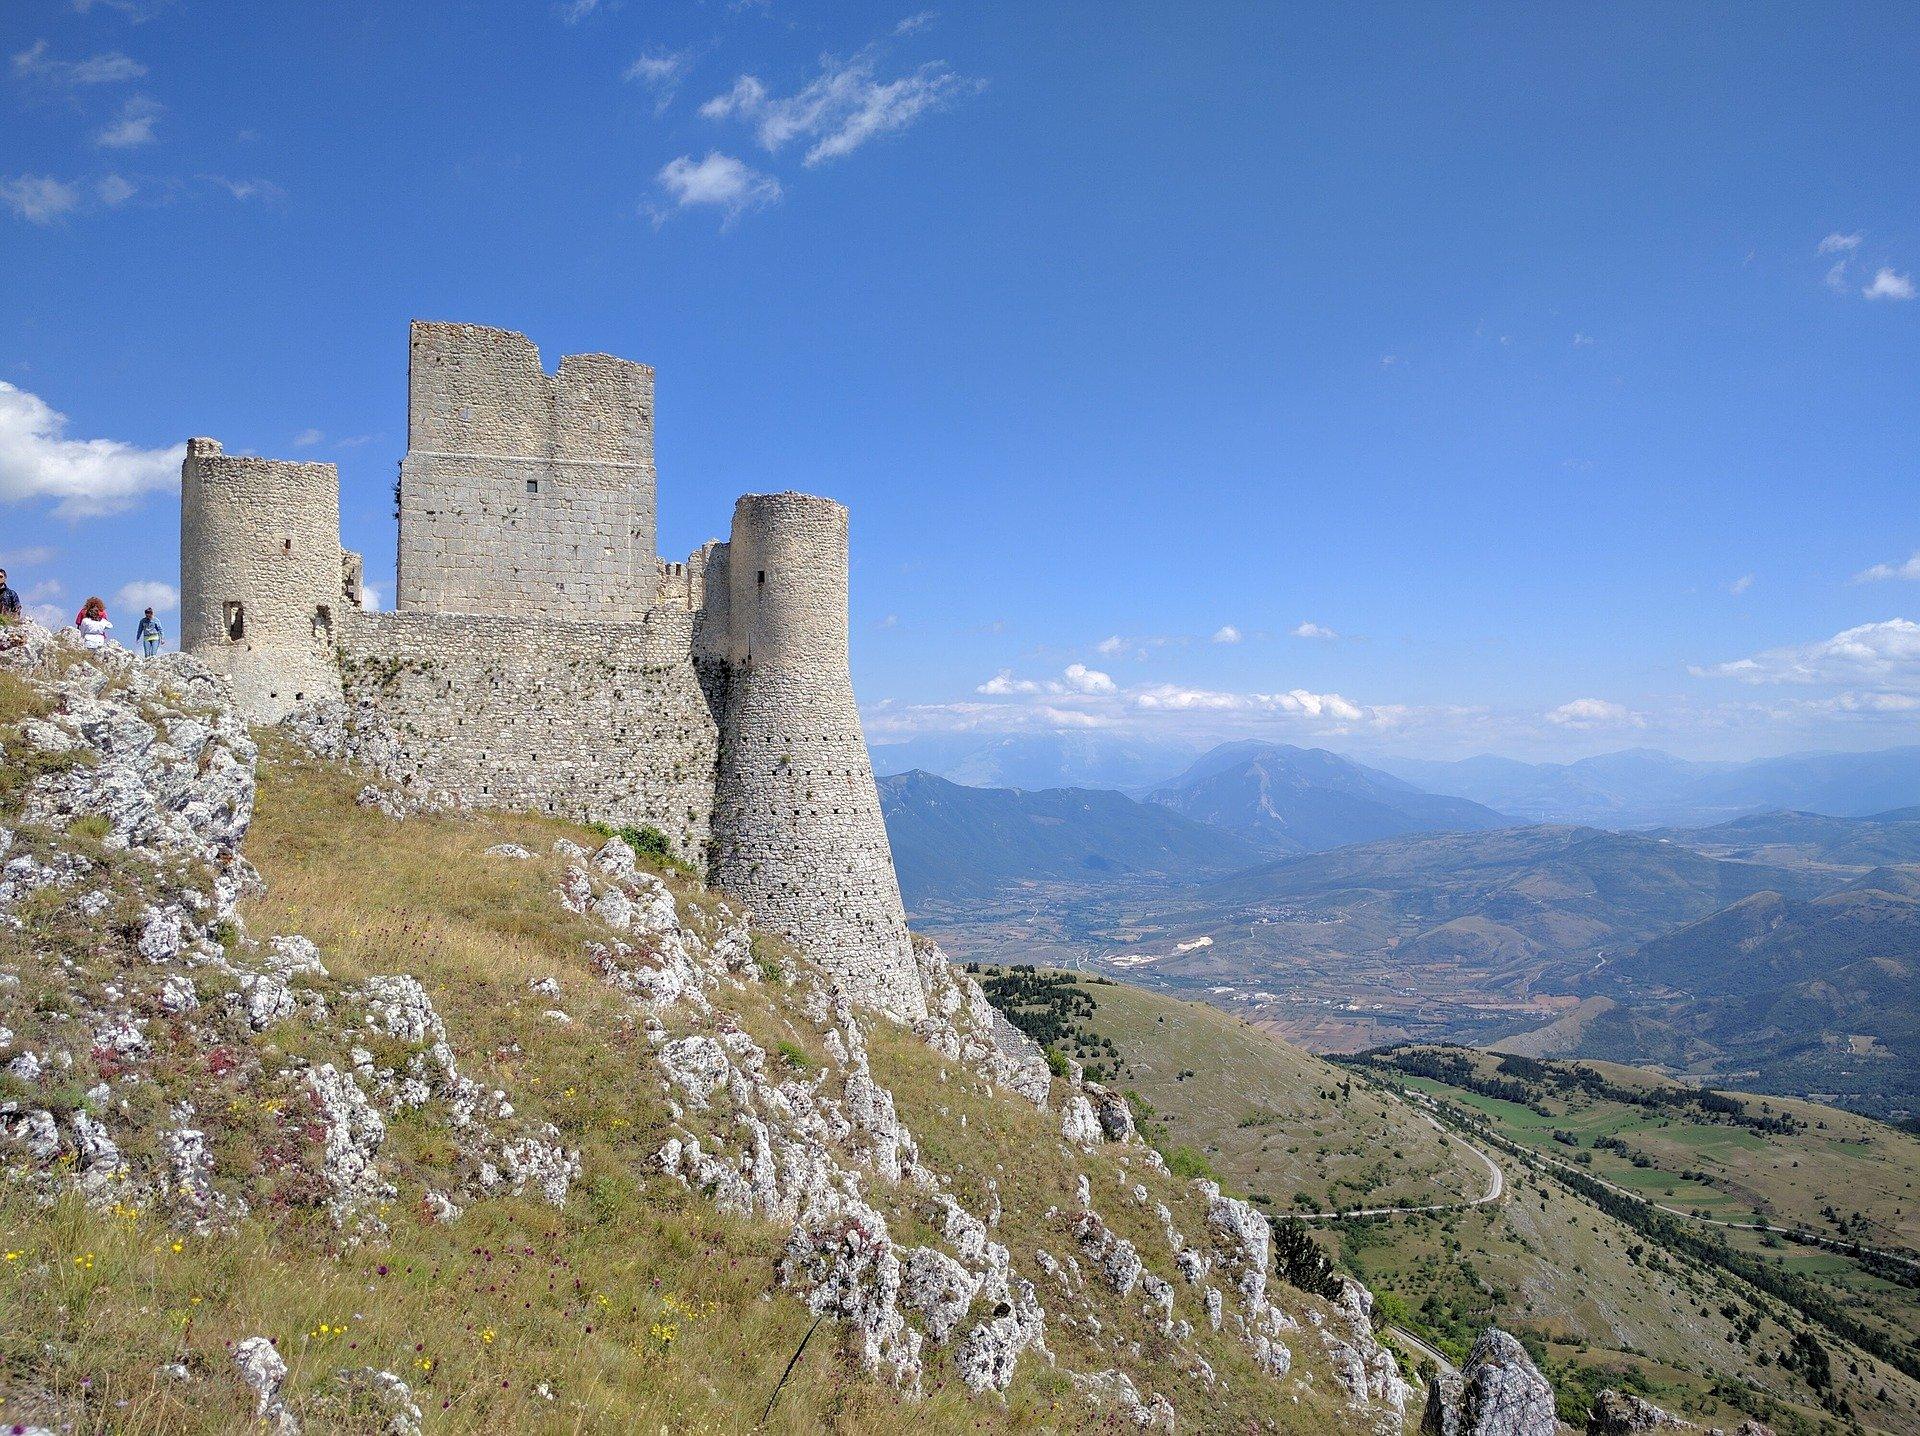 Abruzzo Tours | Holidays in Abruzzo | Abruzzo Vacation | Abruzzo Italy Vacation